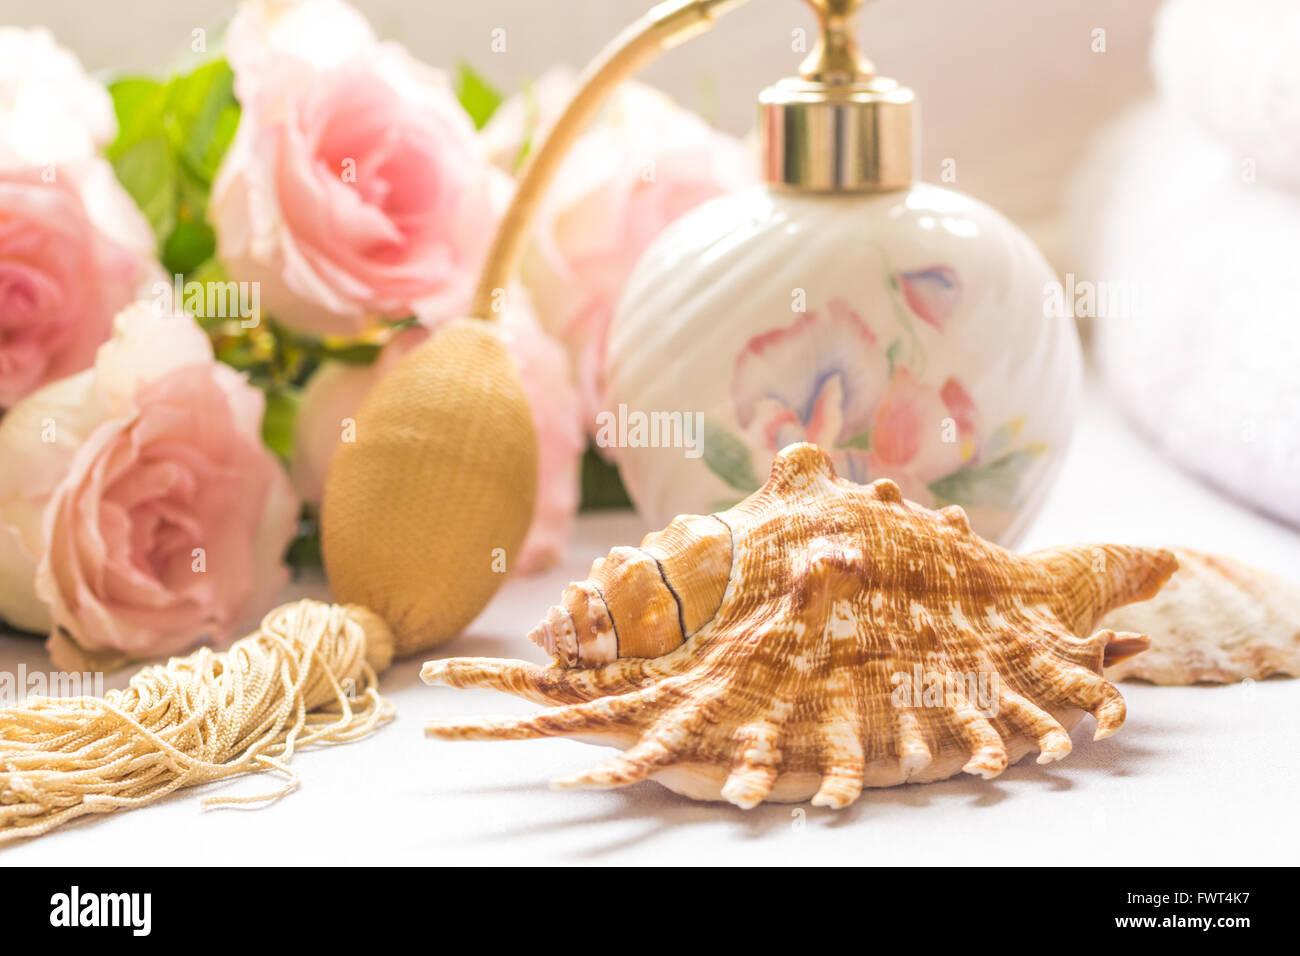 Bath arrangement with perfume bottle pink roses - Stock Image